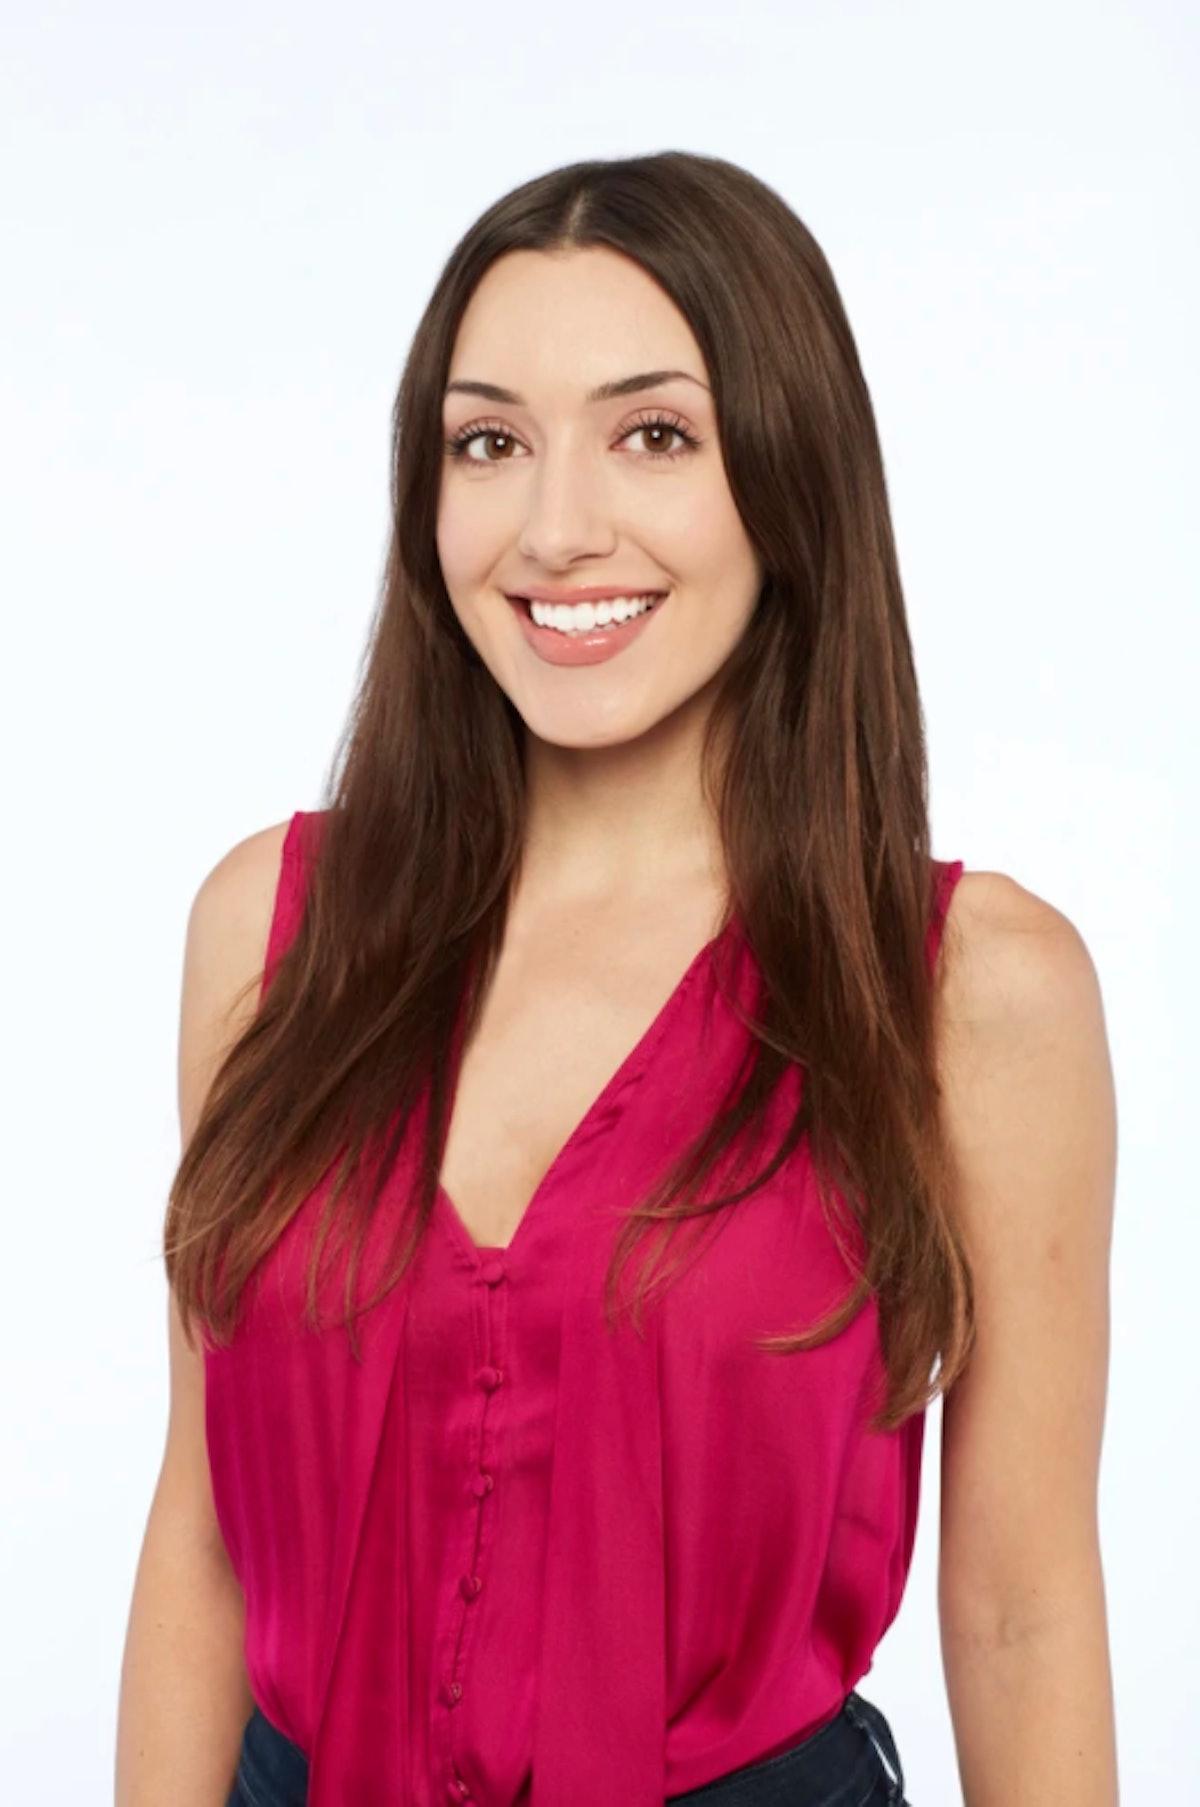 Alana Milne on Season 7 of ABC's 'Bachelor in Paradise'